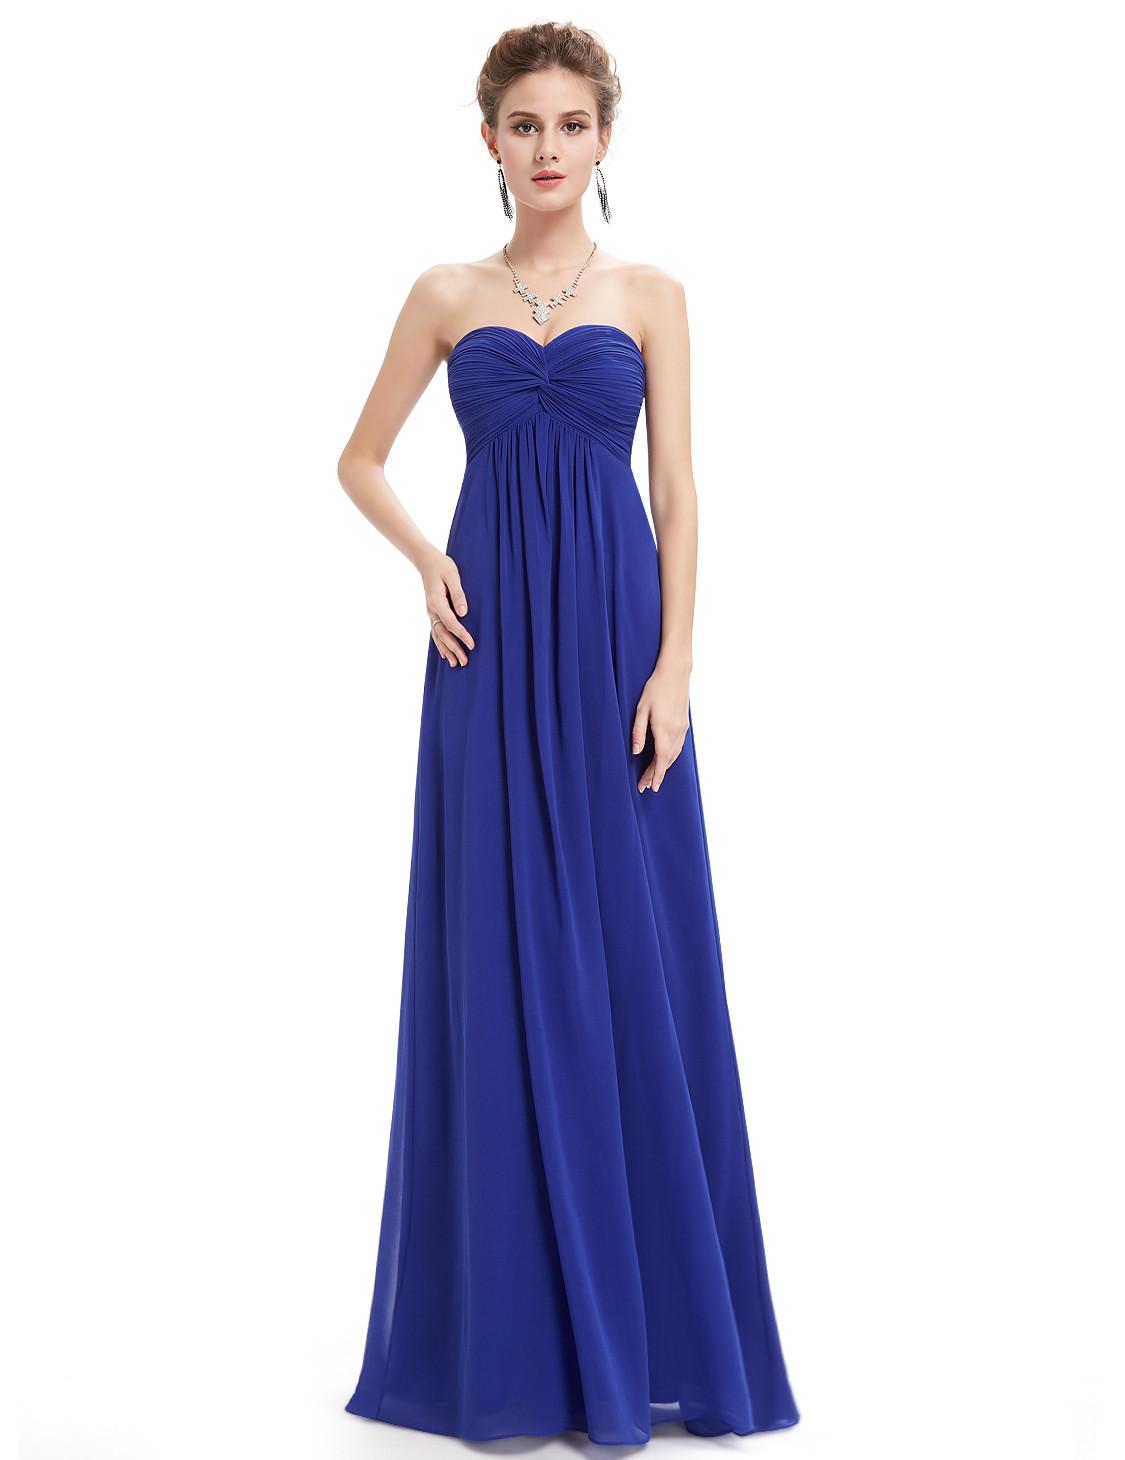 Strapless Royal Blue Sweetheart Bridesmaid Dress